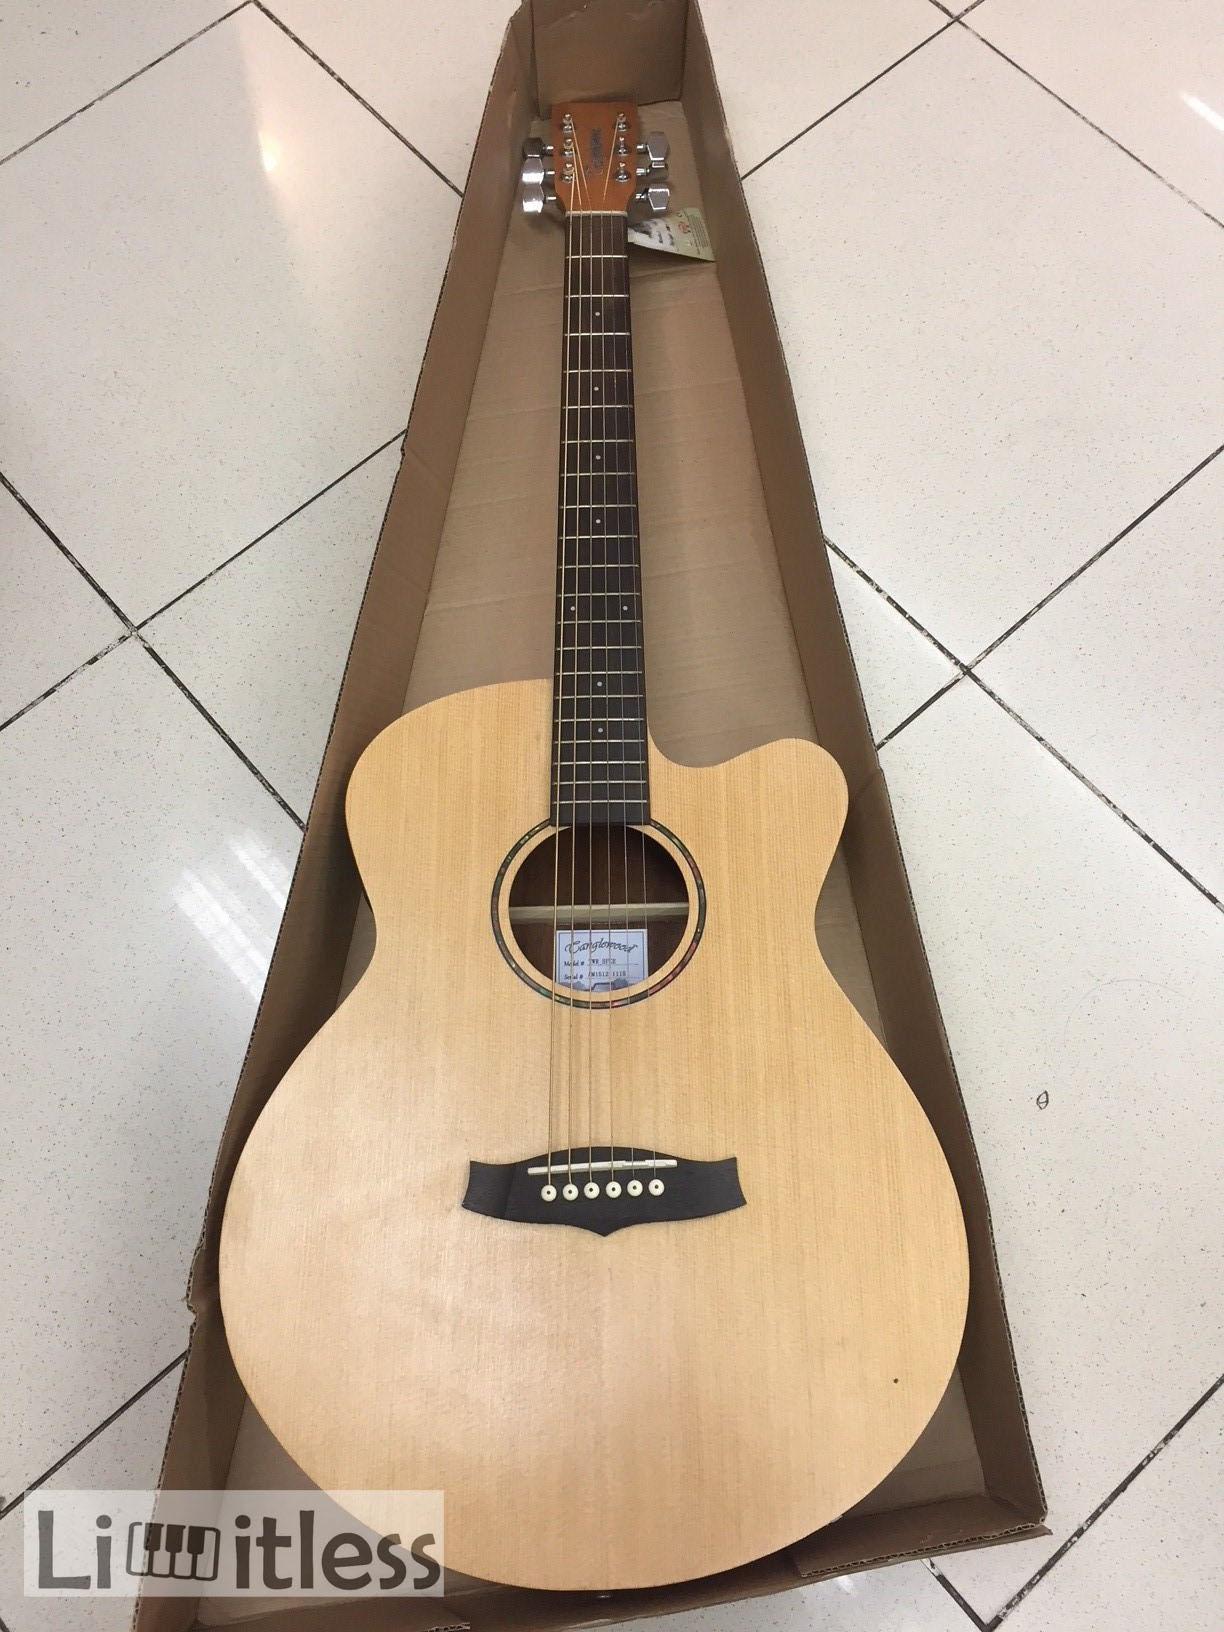 ... Cl 0 011 050 Fosfor Perunggu Baja Ringan Luka ... - Senar Gitar Akustik Steel Original Yamaha Asli (1 Set) ... Source ·. Source · Rp 2.635.000